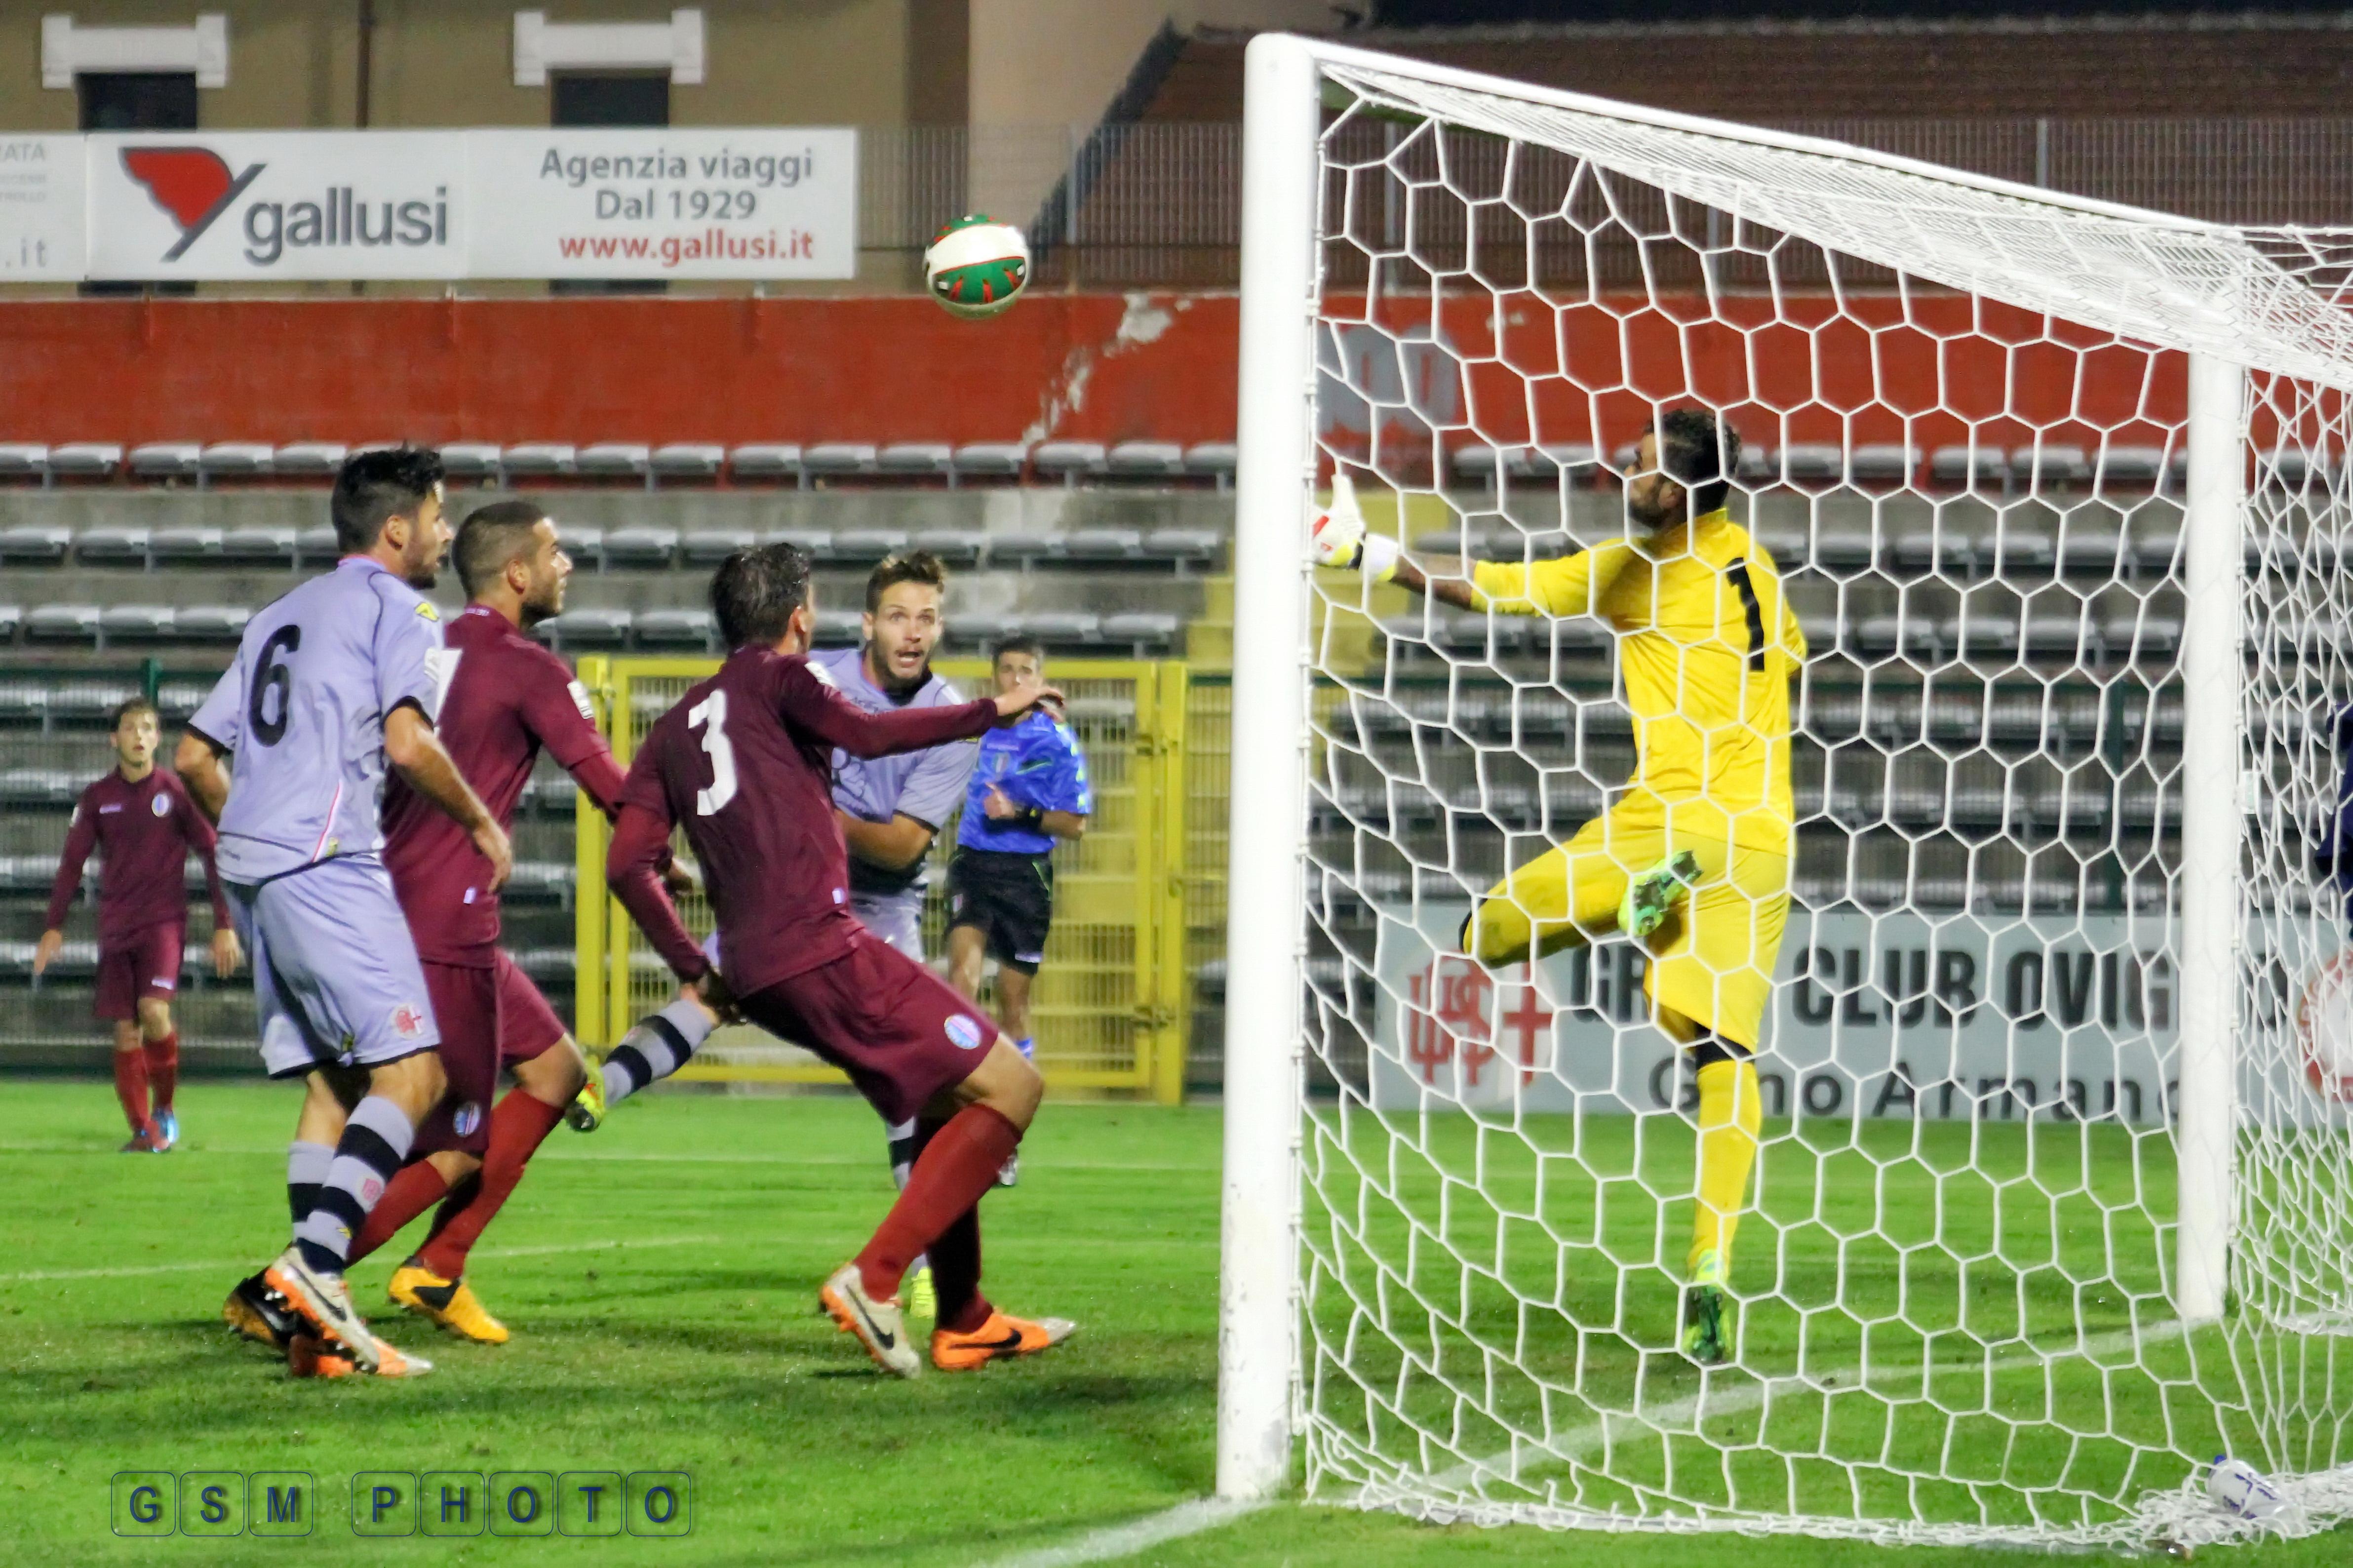 Alessandria-Pavia Coppa Italia_29_10_2014 (5)